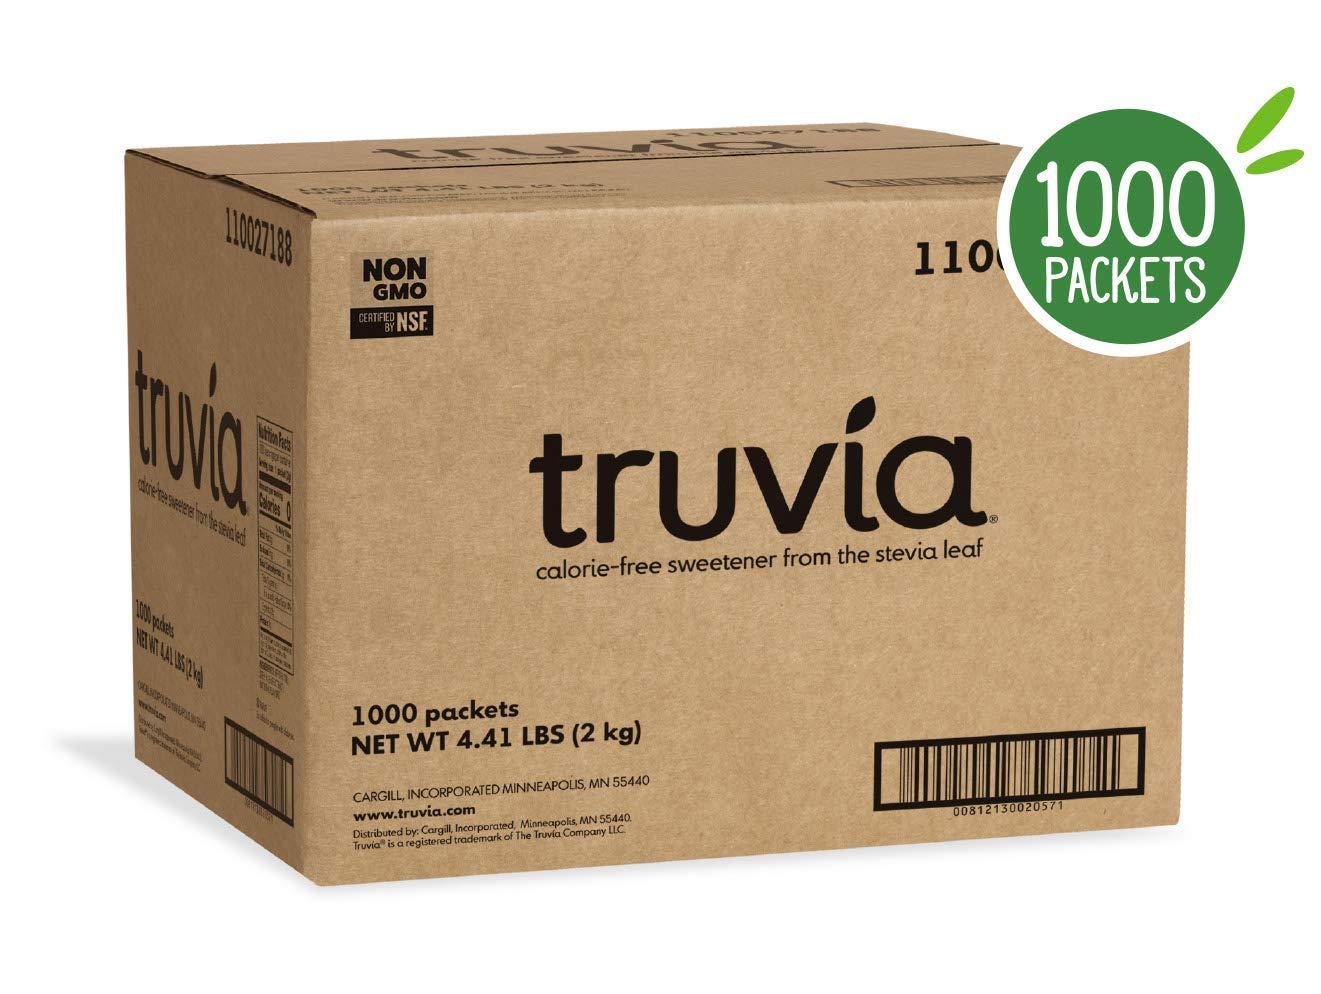 Truvia Natural Stevia Sweetener Packets, 1,000-Count Box (Net Wt. 70.5 oz) by TRUVÍA